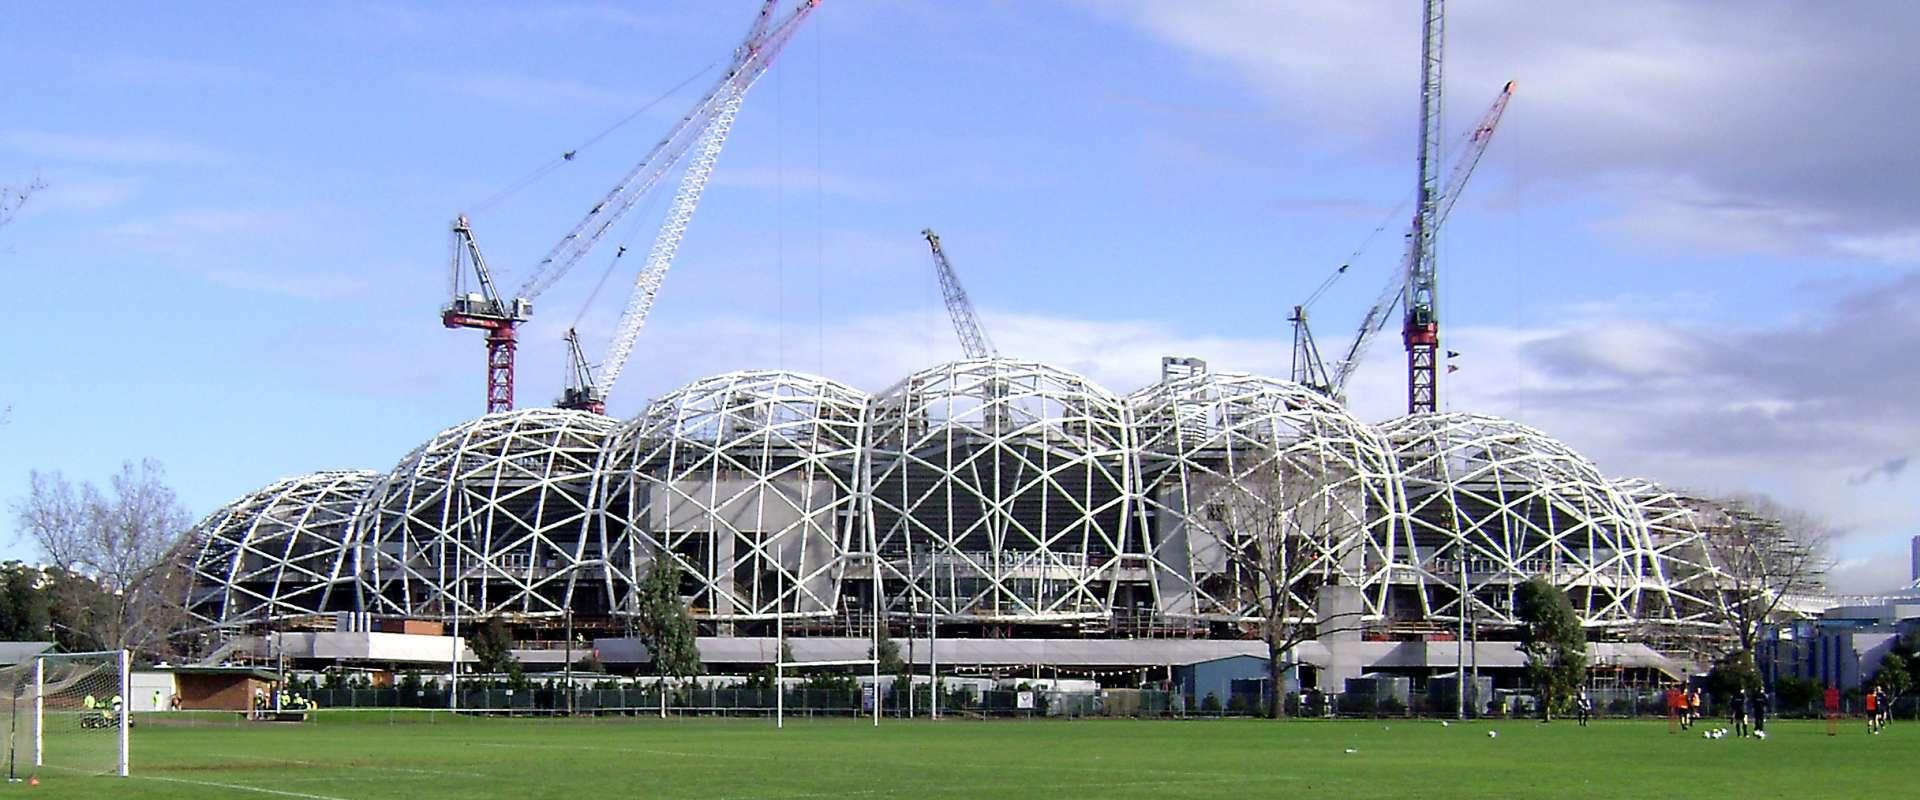 Stadium view1